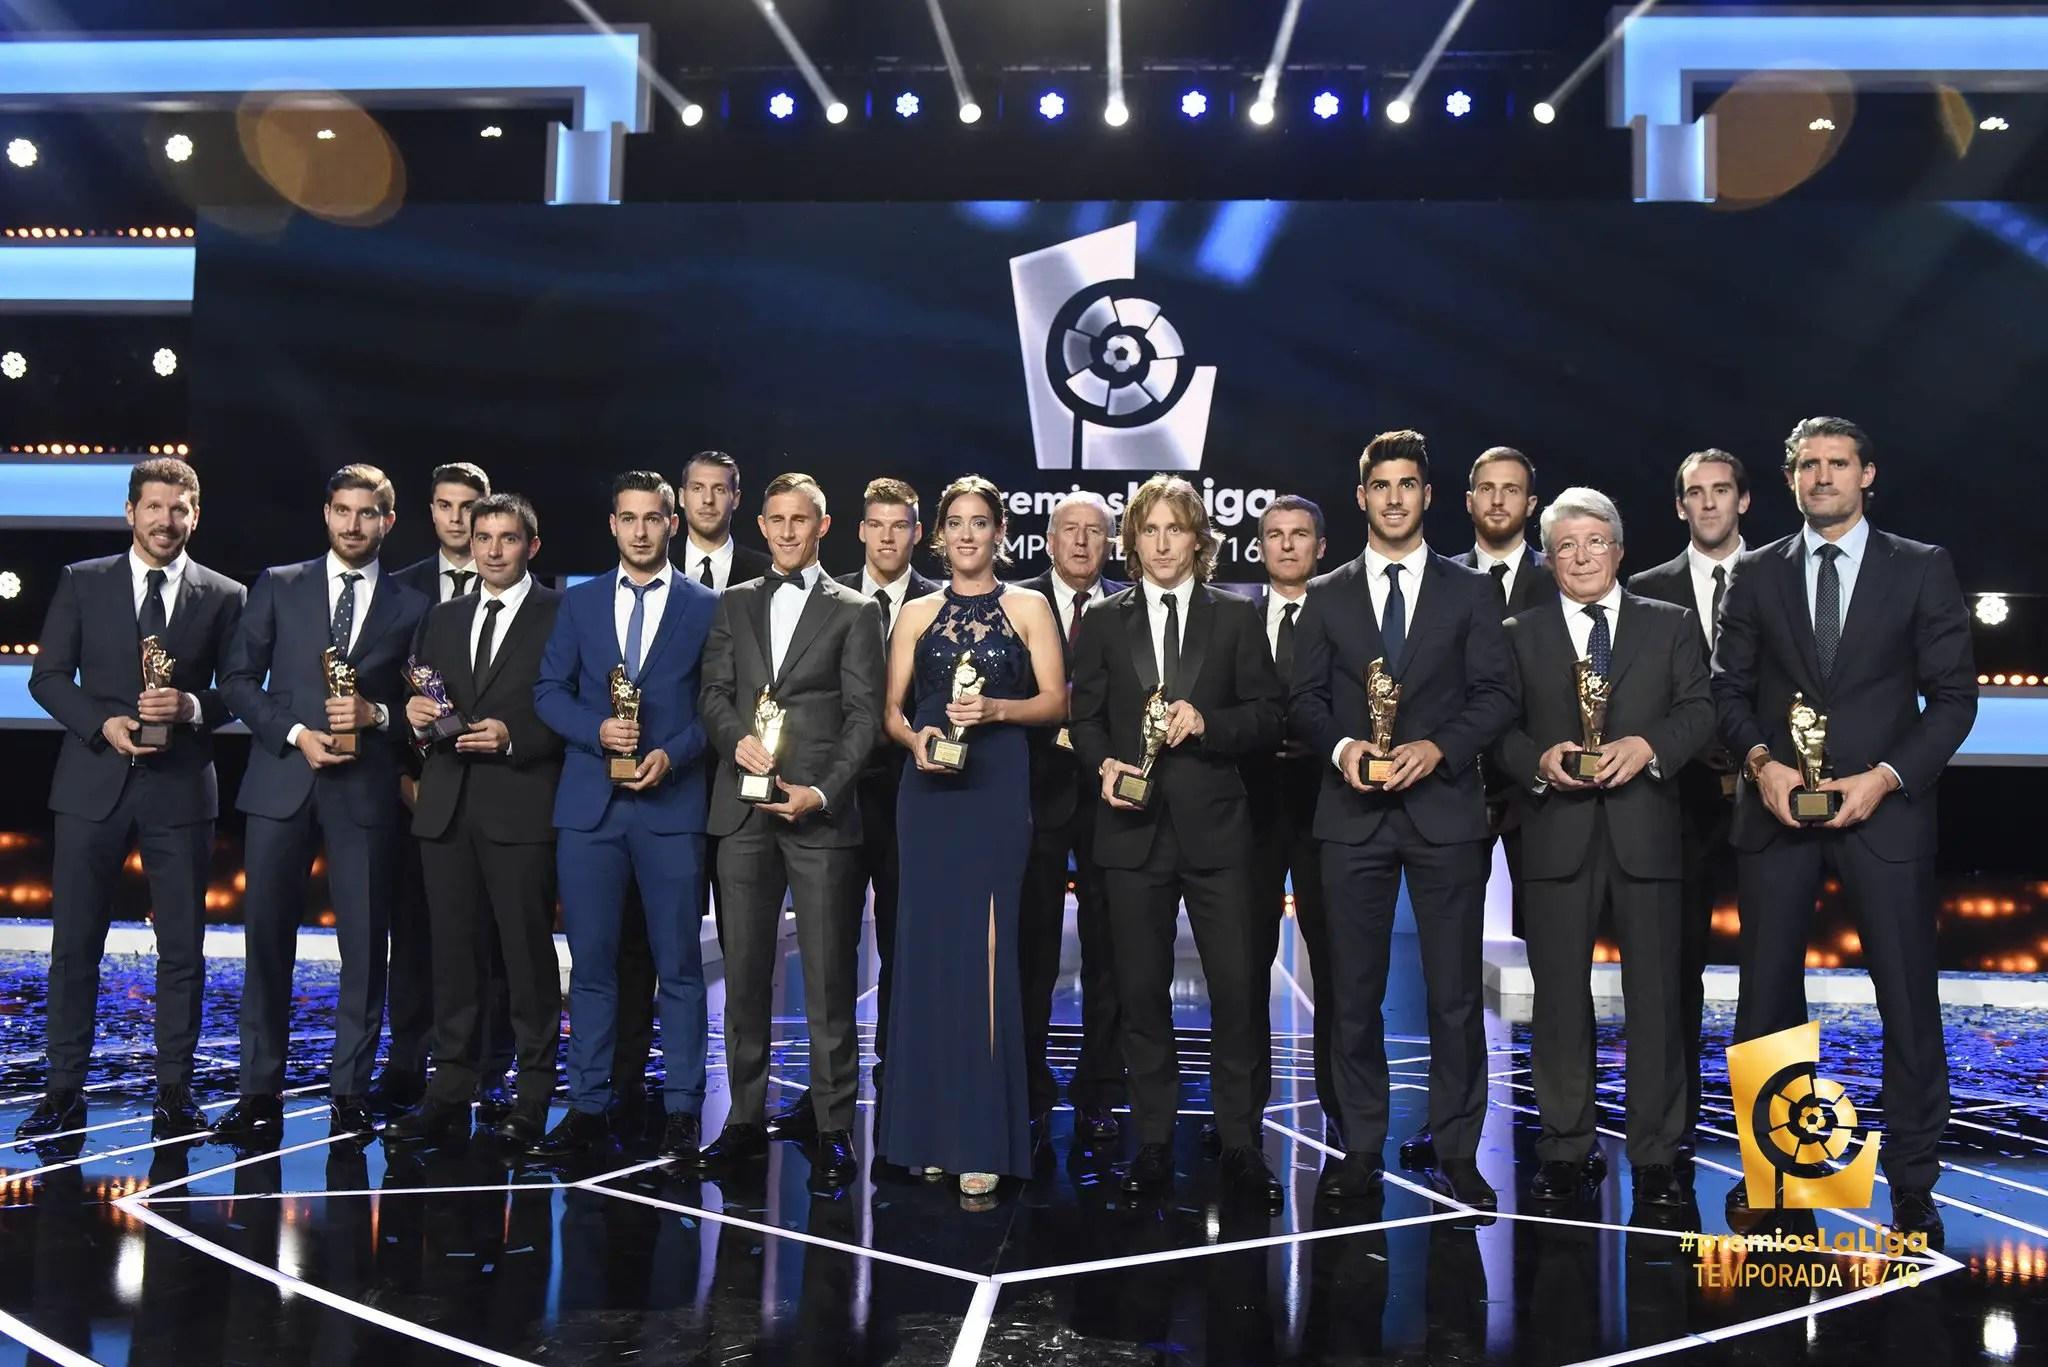 Messi, Griezmann, Suarez, Modric Win LaLiga Awards; Ronaldo Snubbed